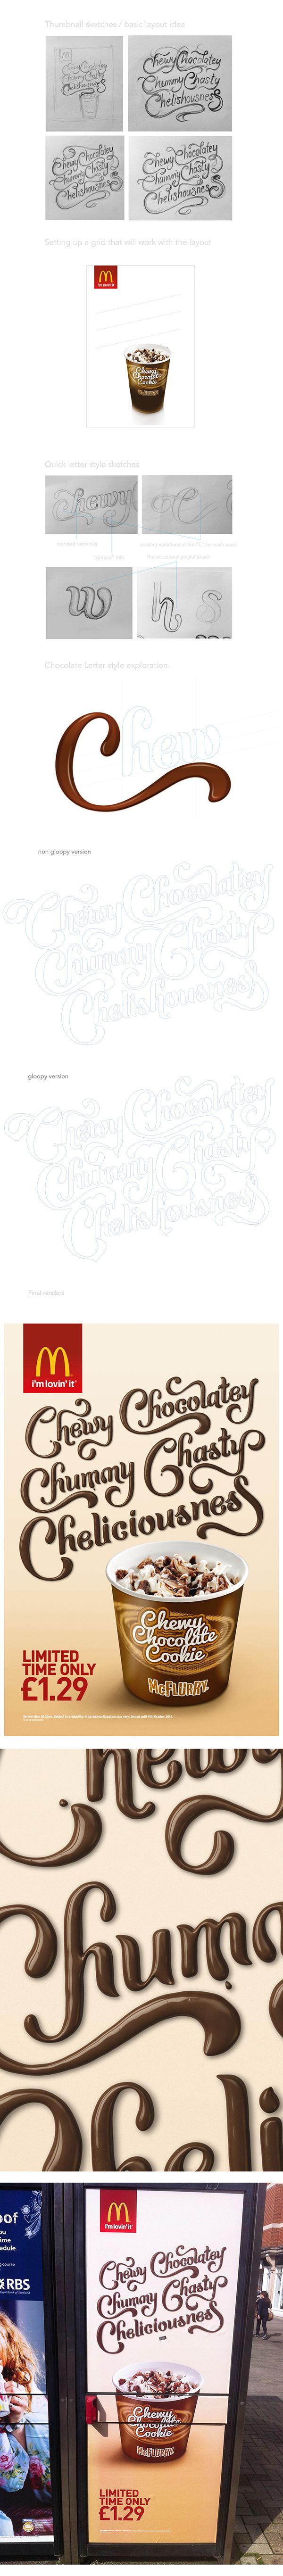 by Leo Burnet UK via Chocoladesign